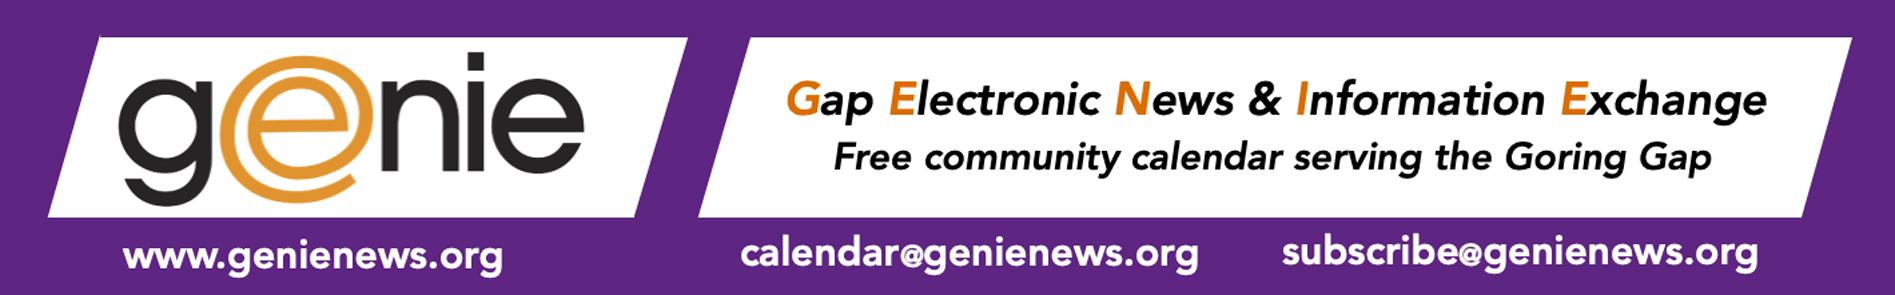 www.genienews.org